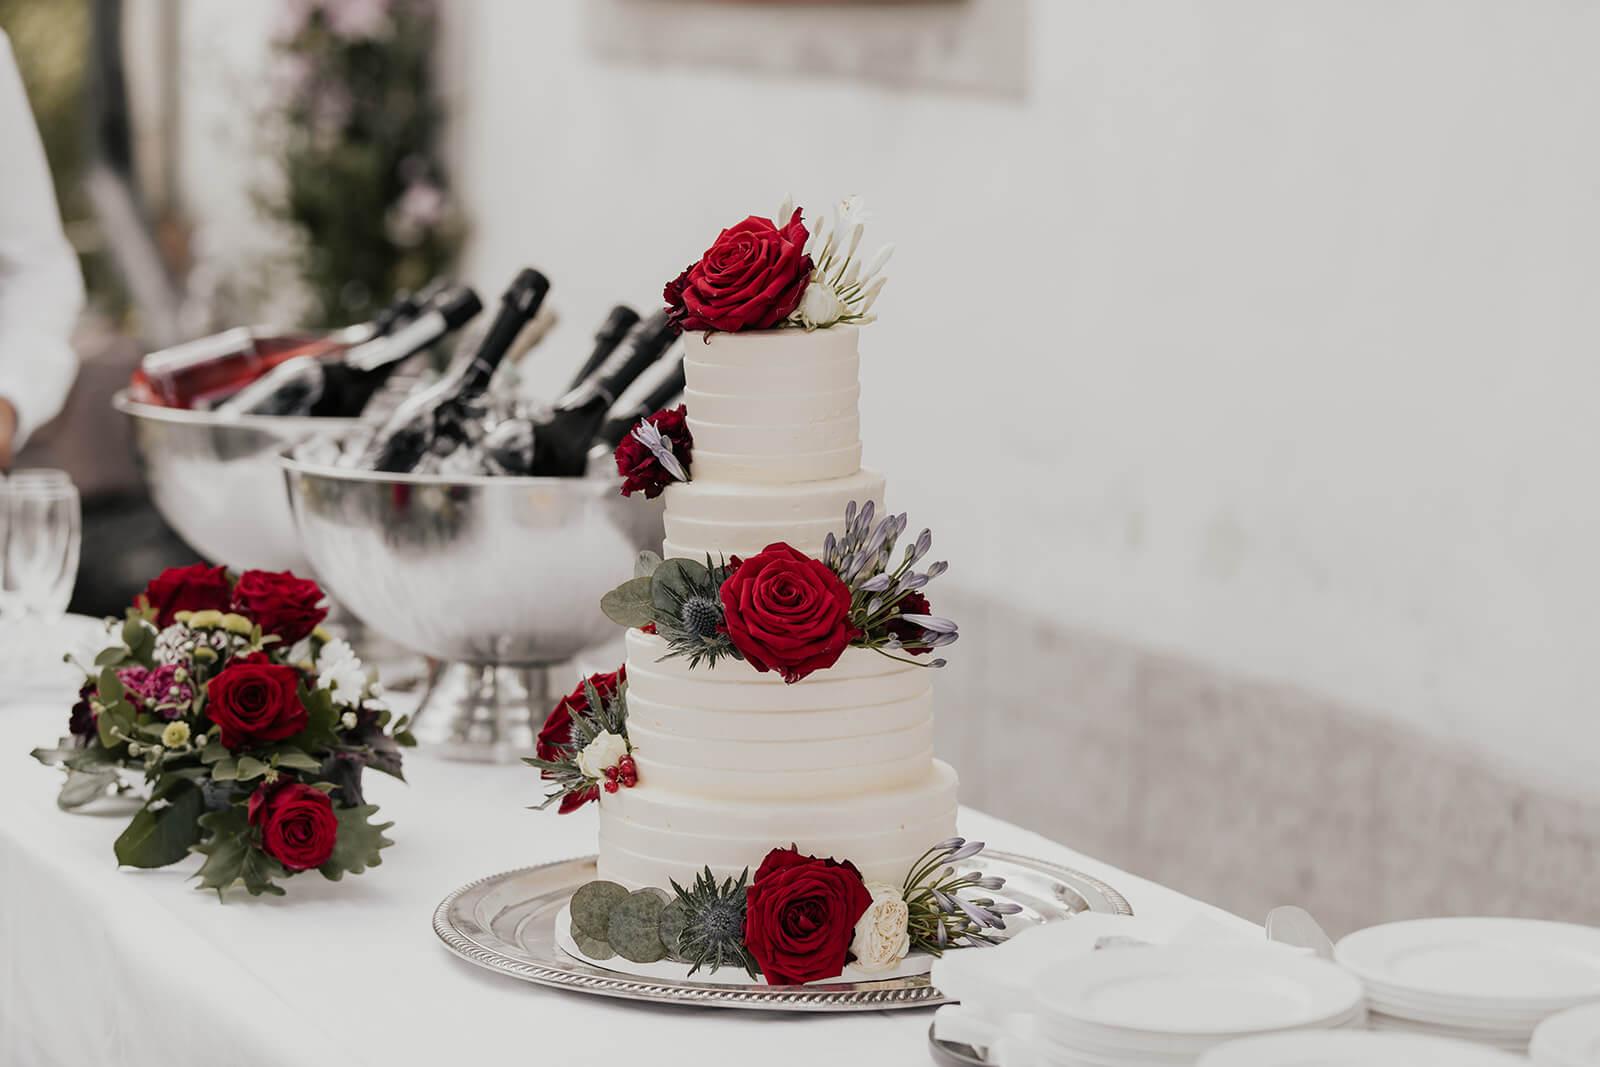 En bröllopstårta från CakeByMelina i Norrköping